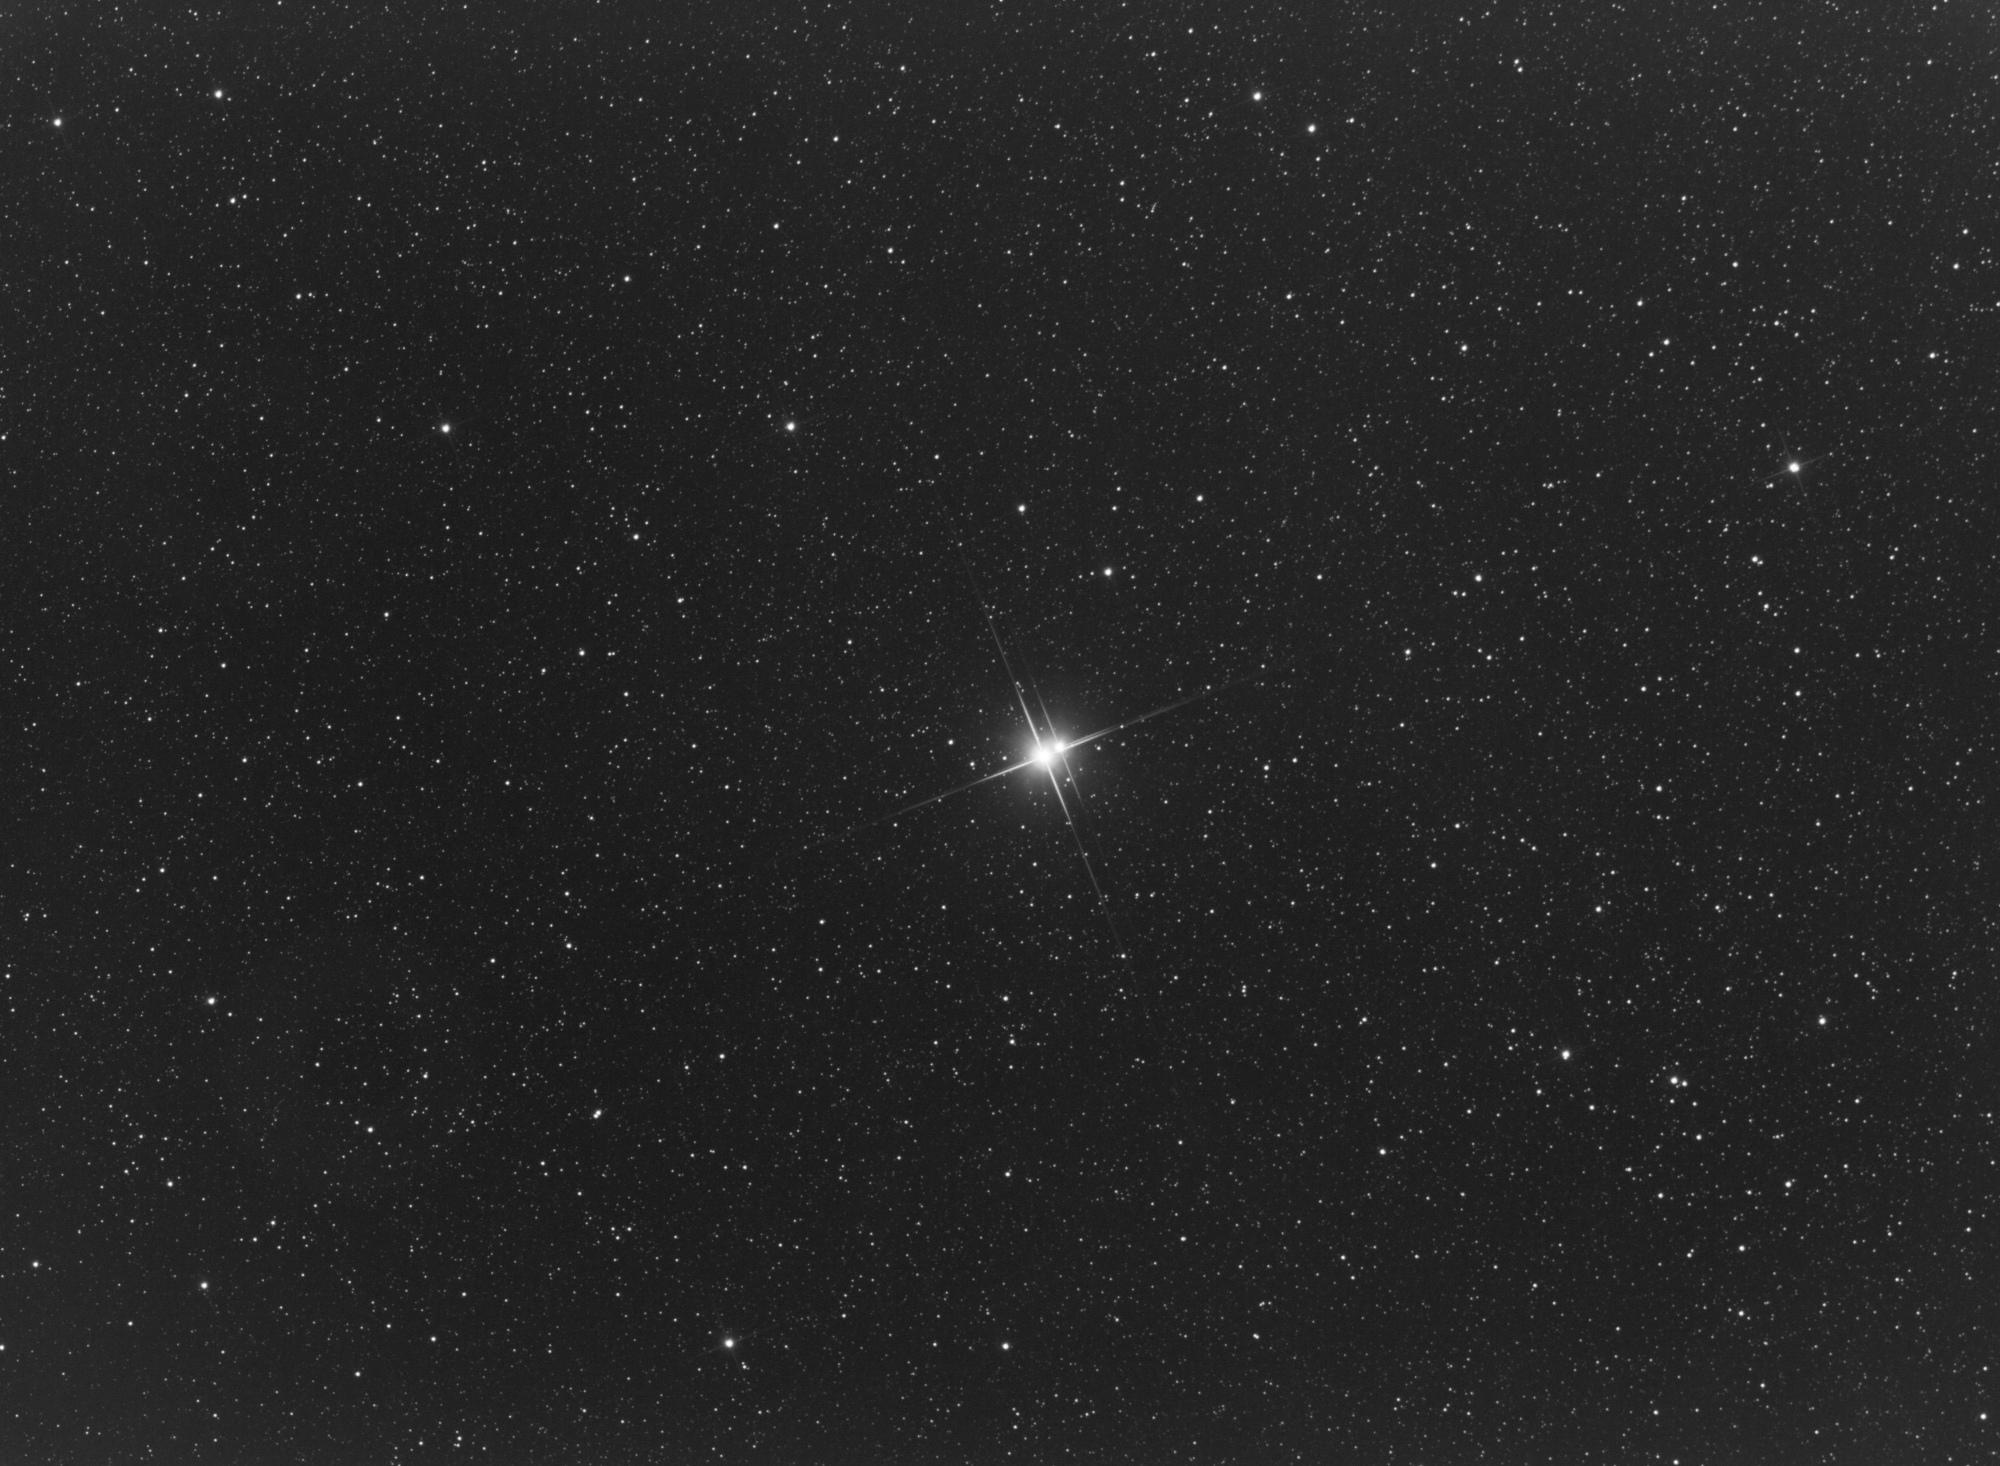 polaris.thumb.jpg.812bb2136835e61d6d4208603f91392e.jpg